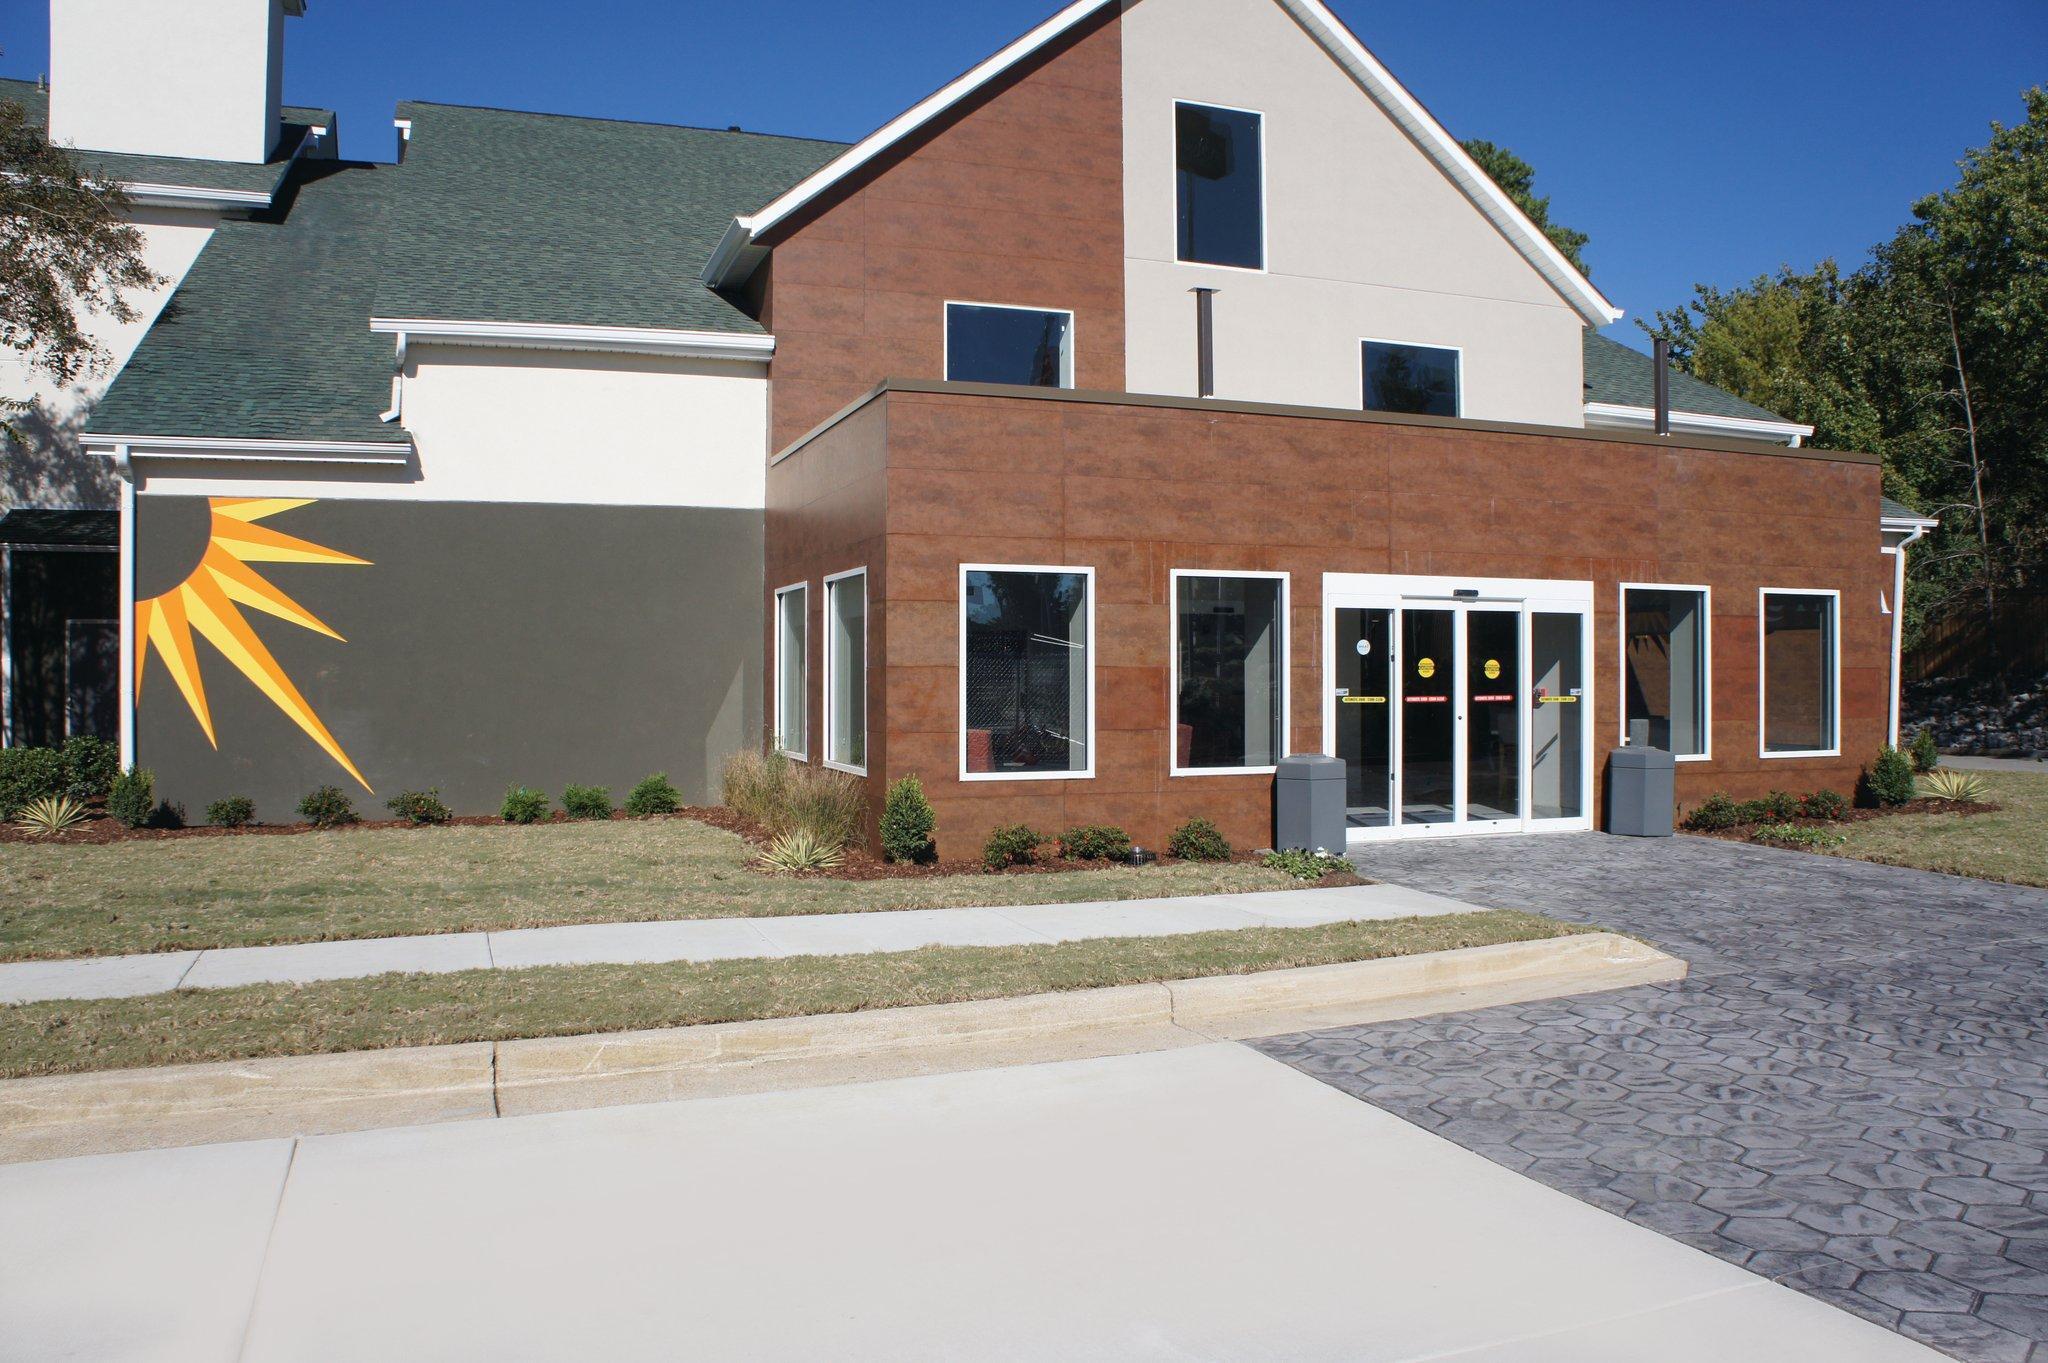 La Quinta Inn & Suites By Wyndham Chattanooga Hamilton Place